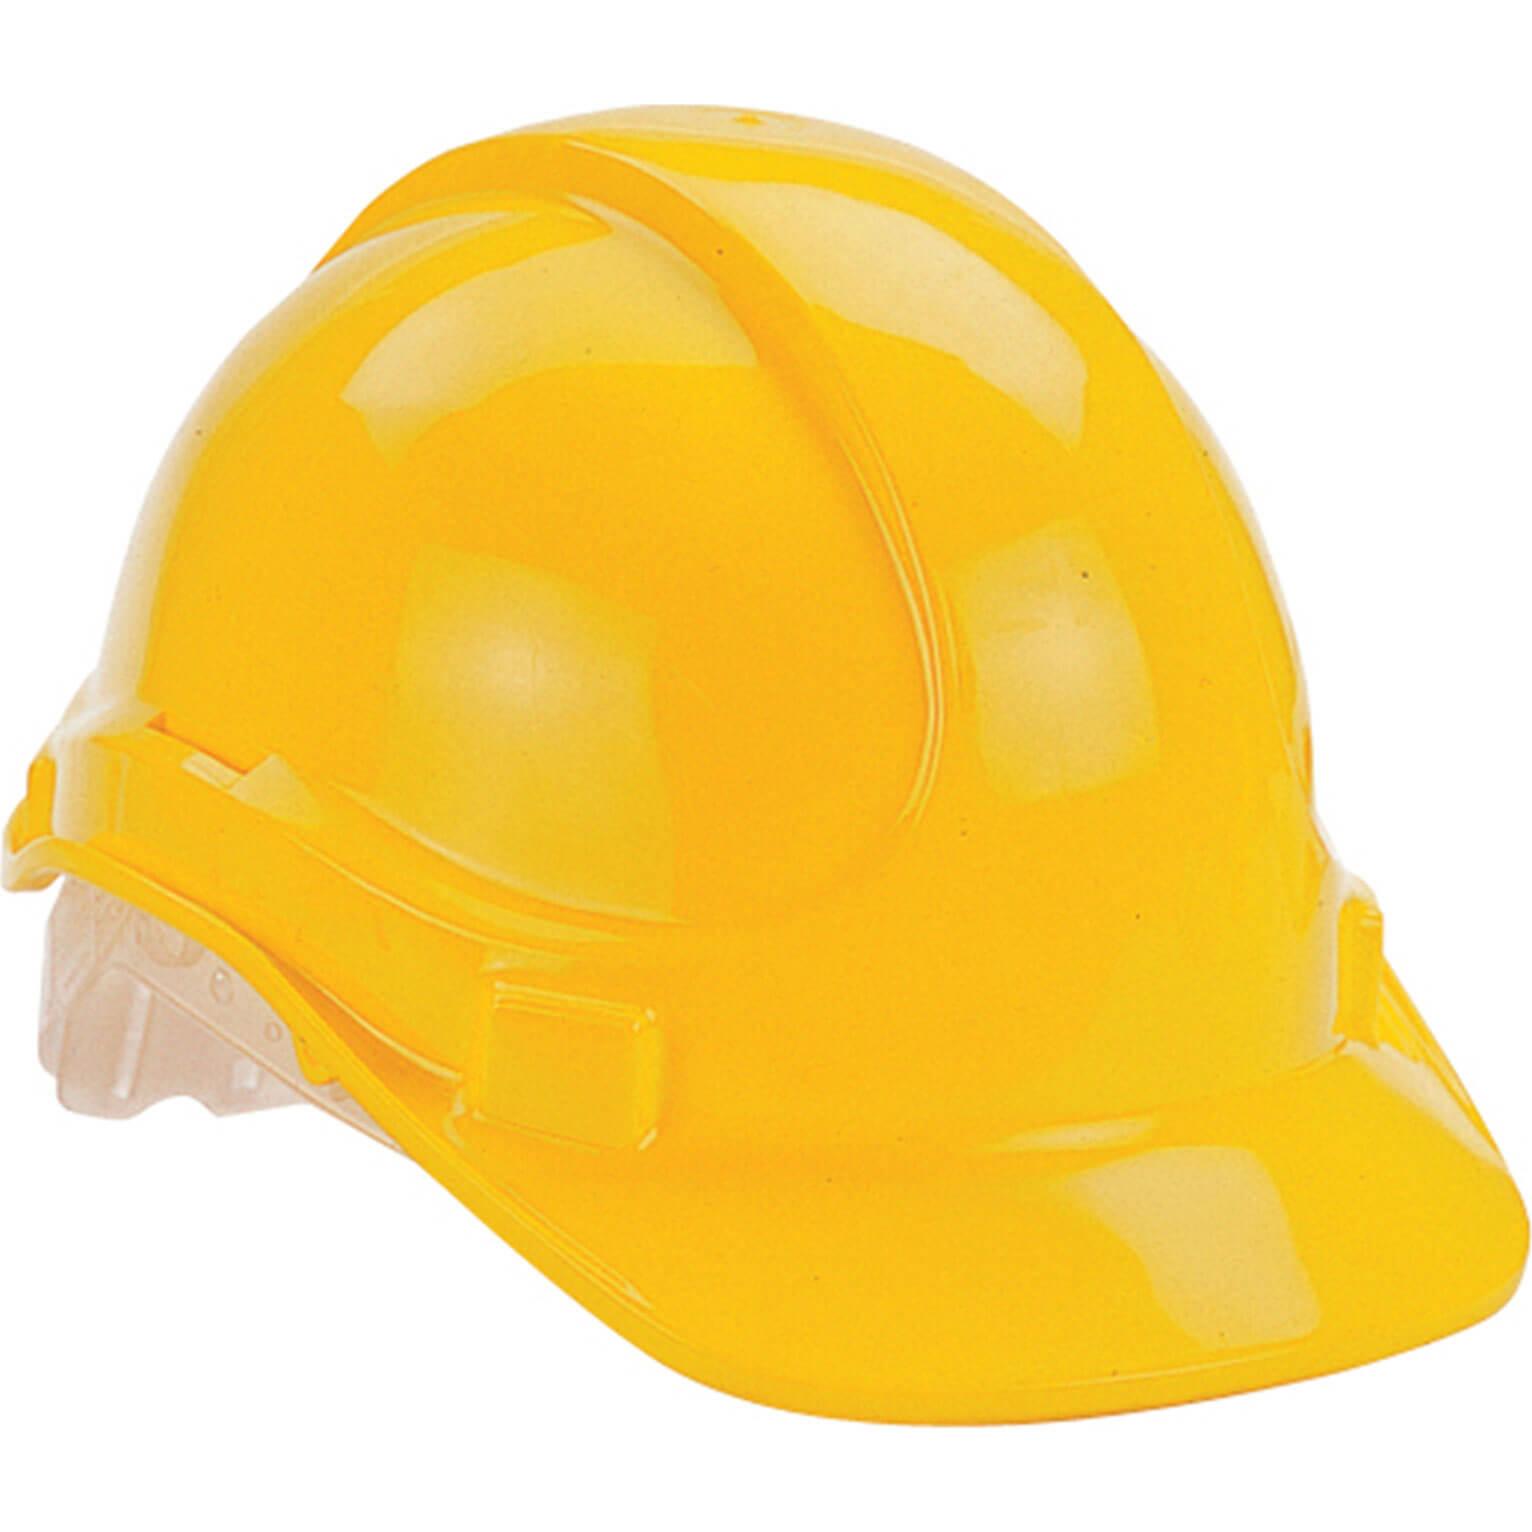 Vitrex Hard Hat Safety Helmet Yellow